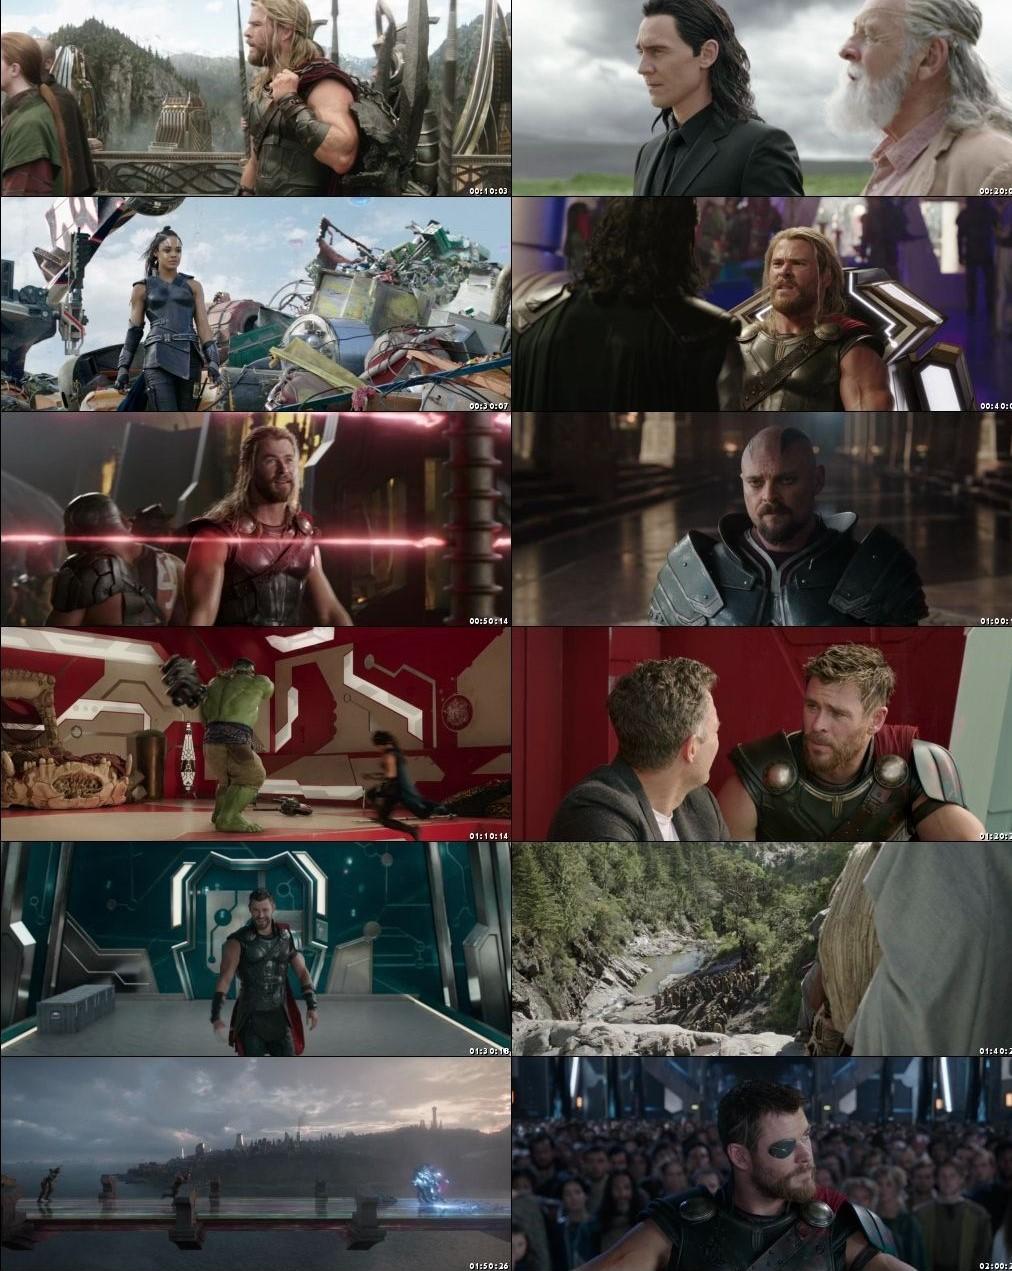 Thor: Ragnarok 2017 BRRip 720p Dual Audio In Hindi English